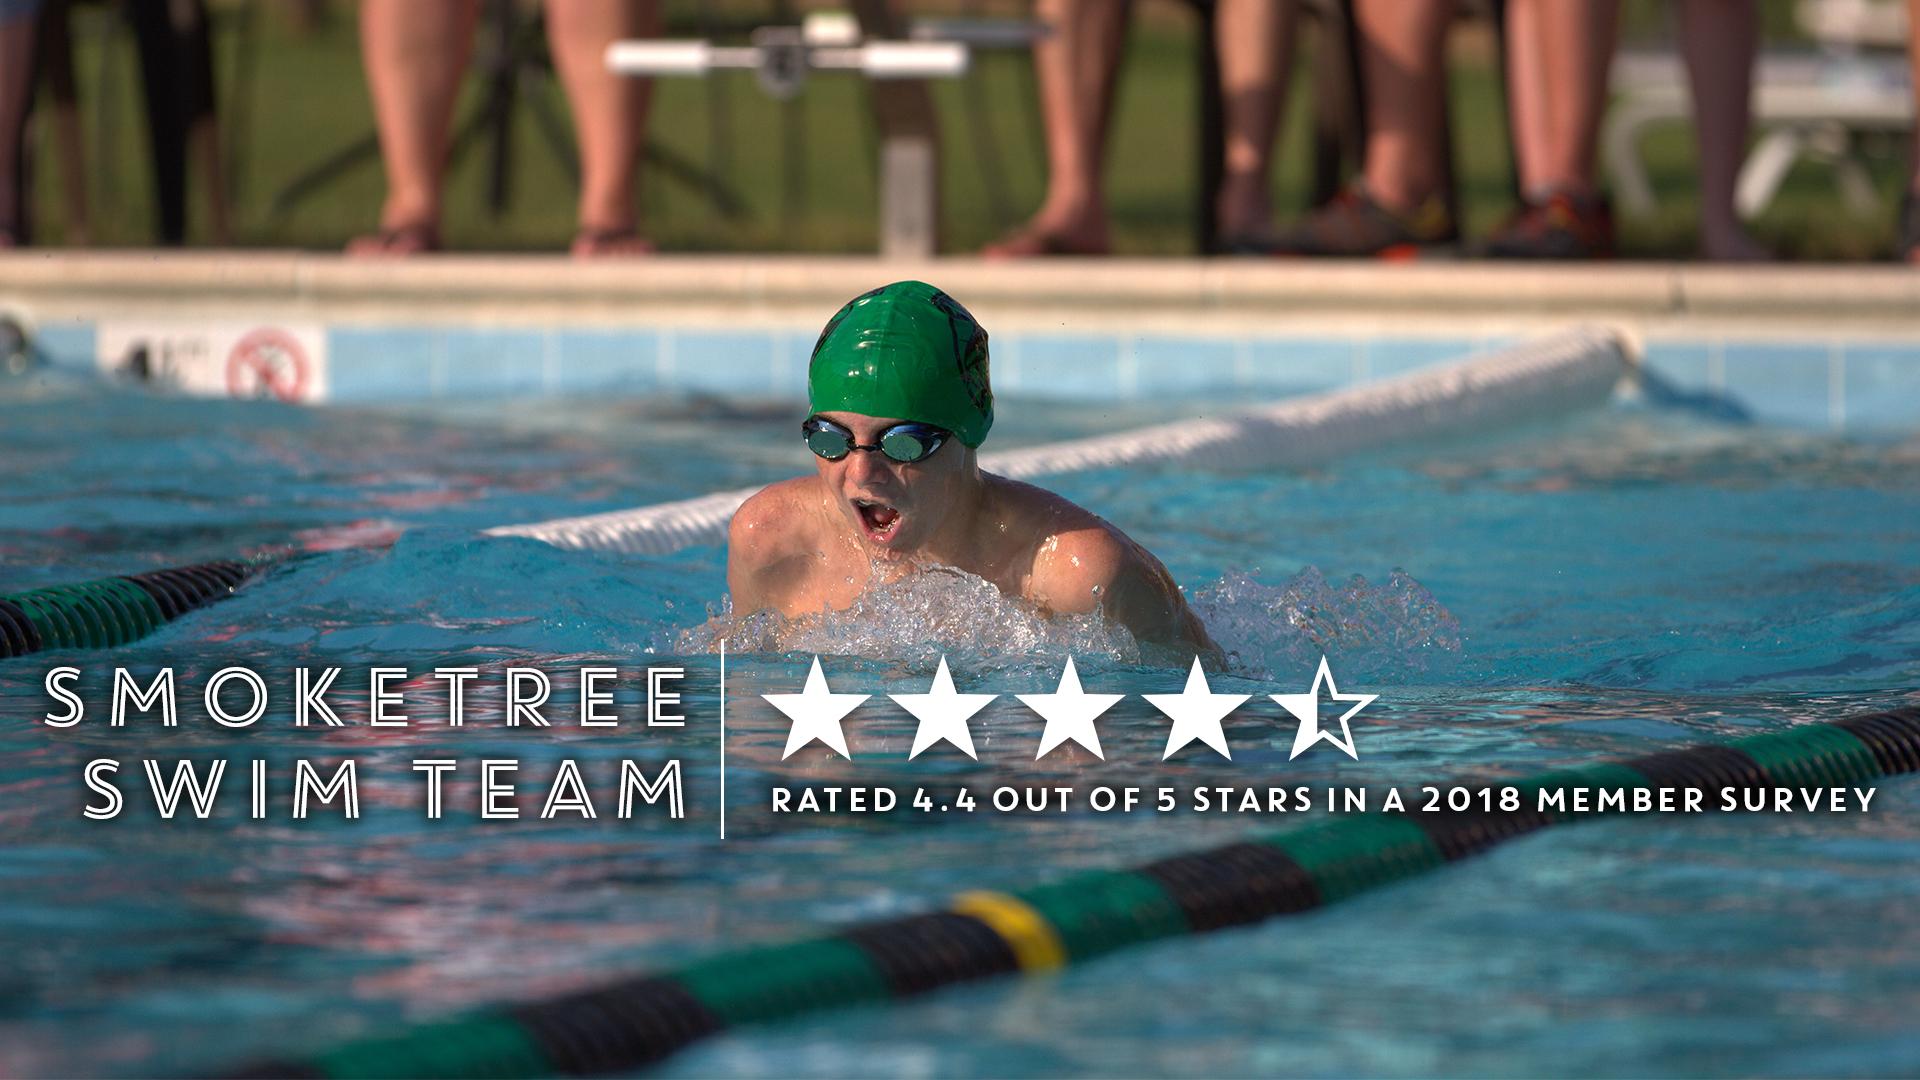 Smoketree FB Post Swim Team 2018.jpg